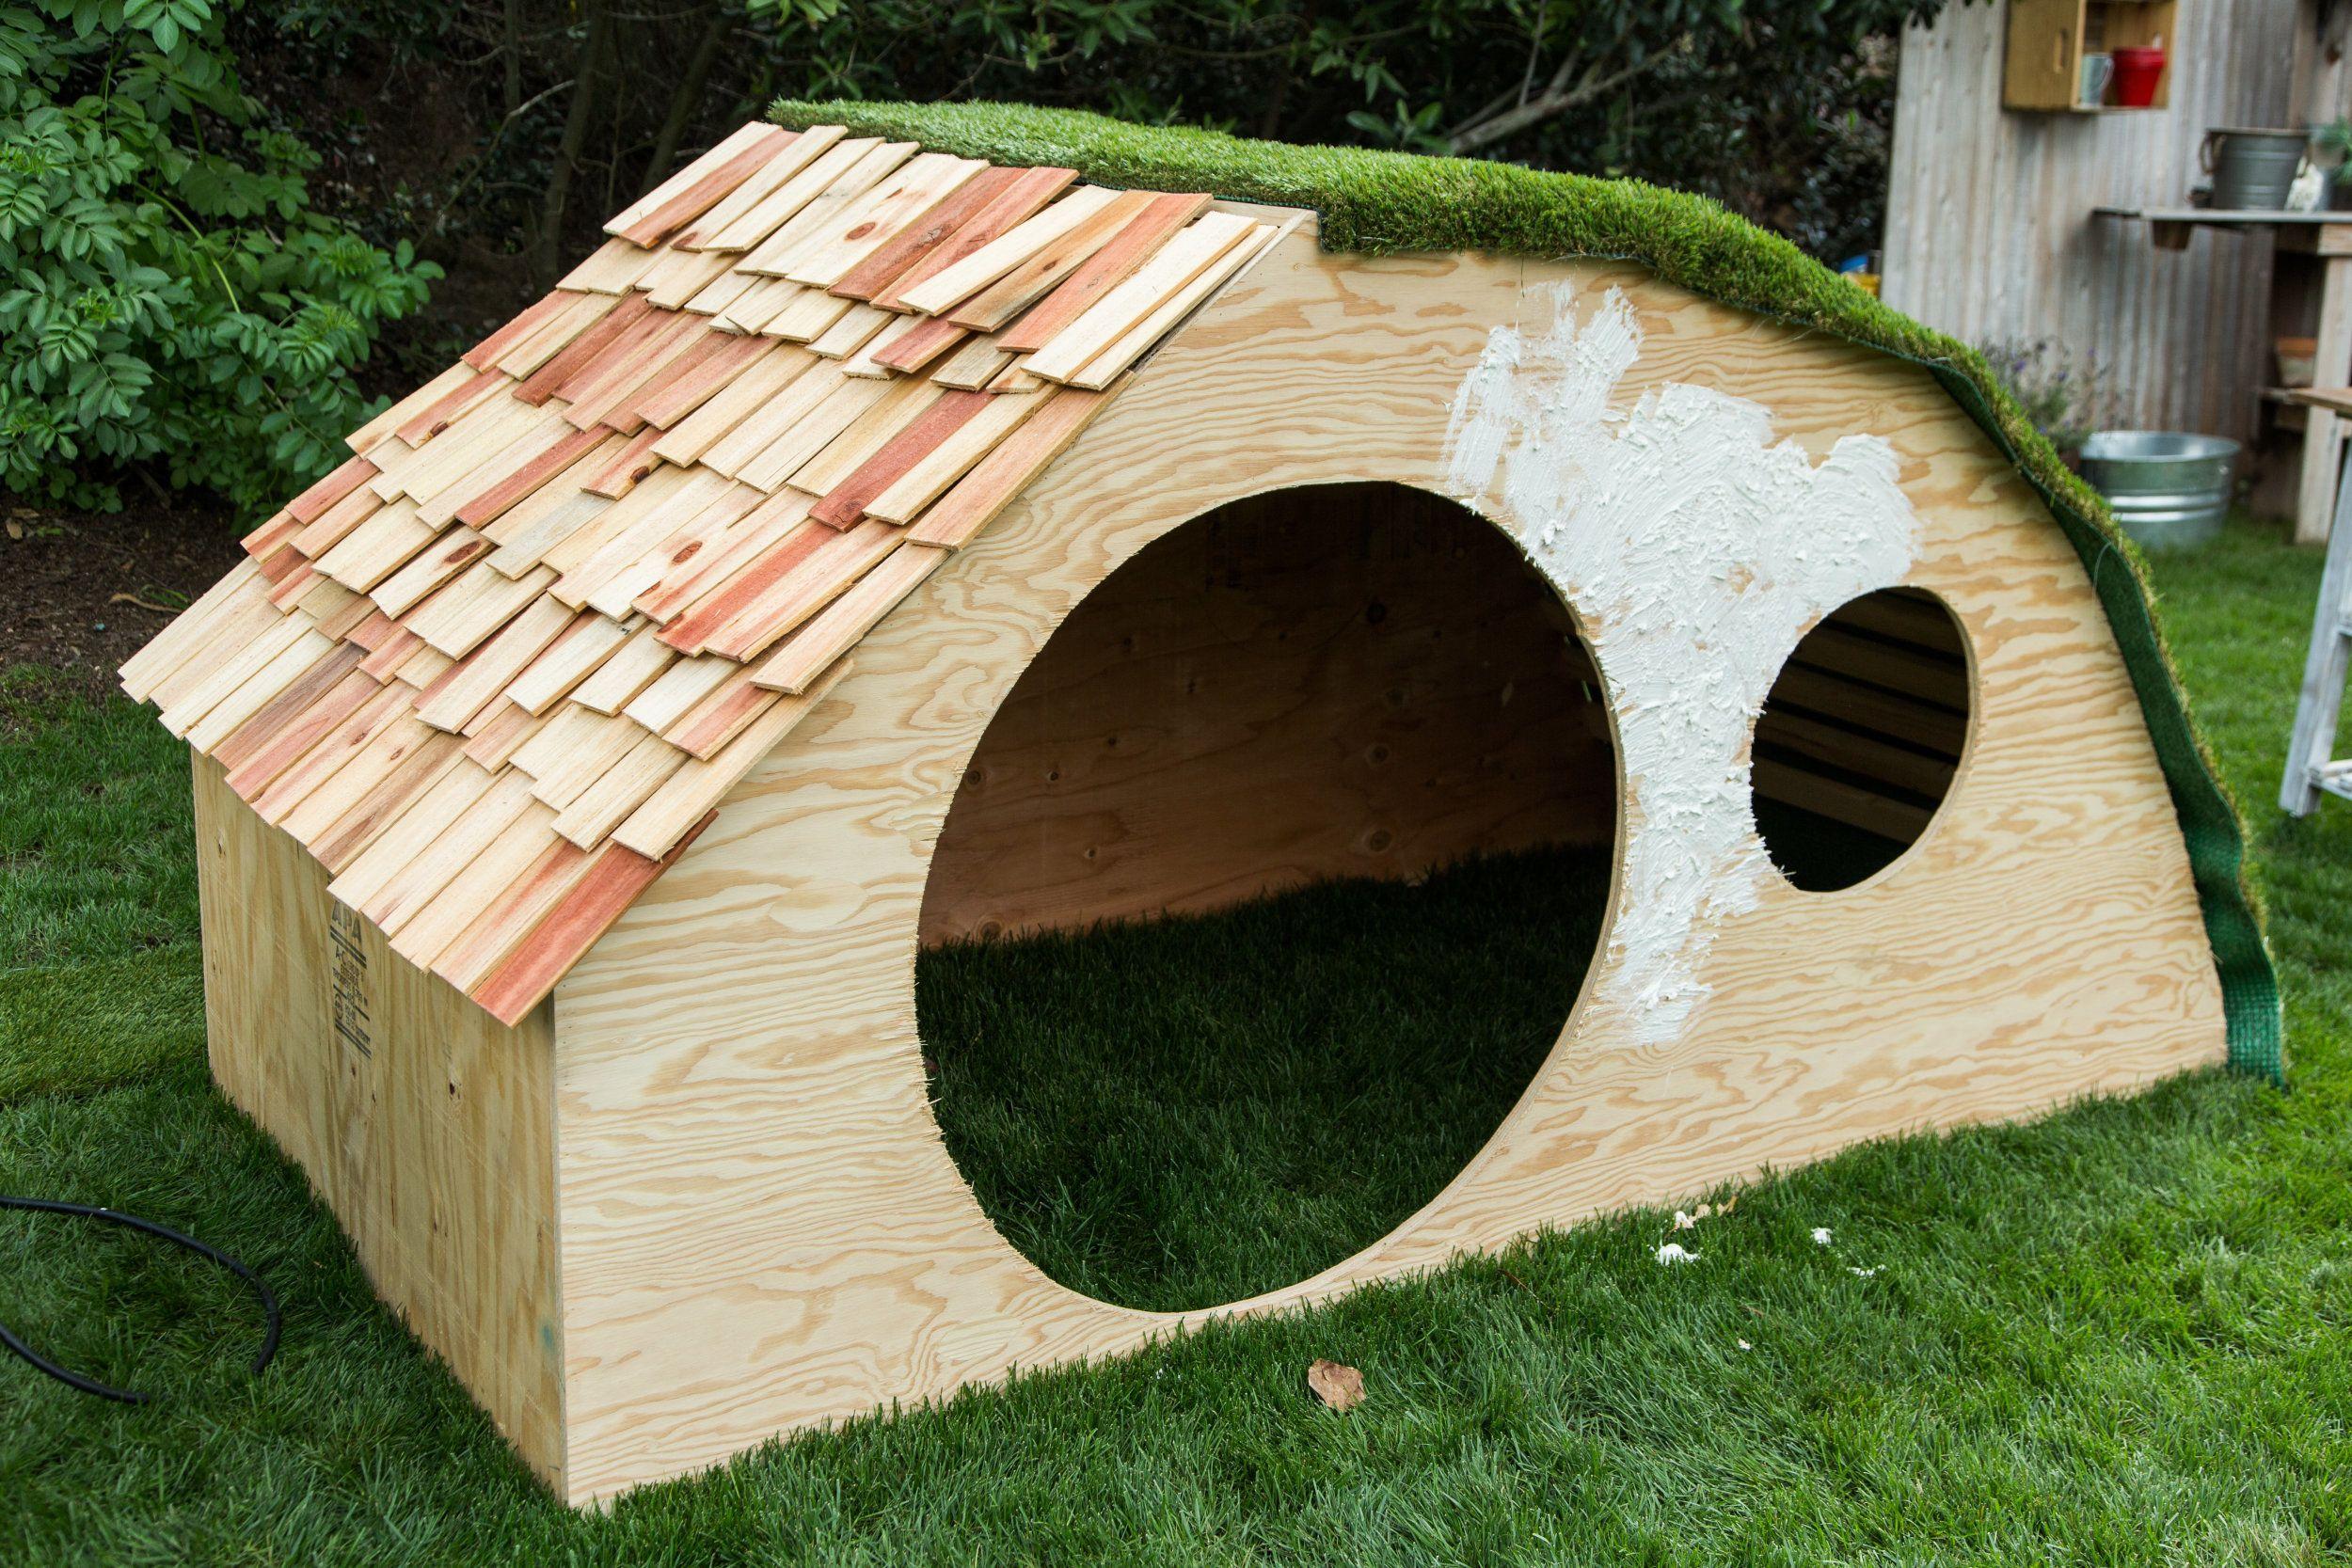 Diy Hobbit Hole Playhouse Play Houses Hobbit Houses Diy Build A Playhouse